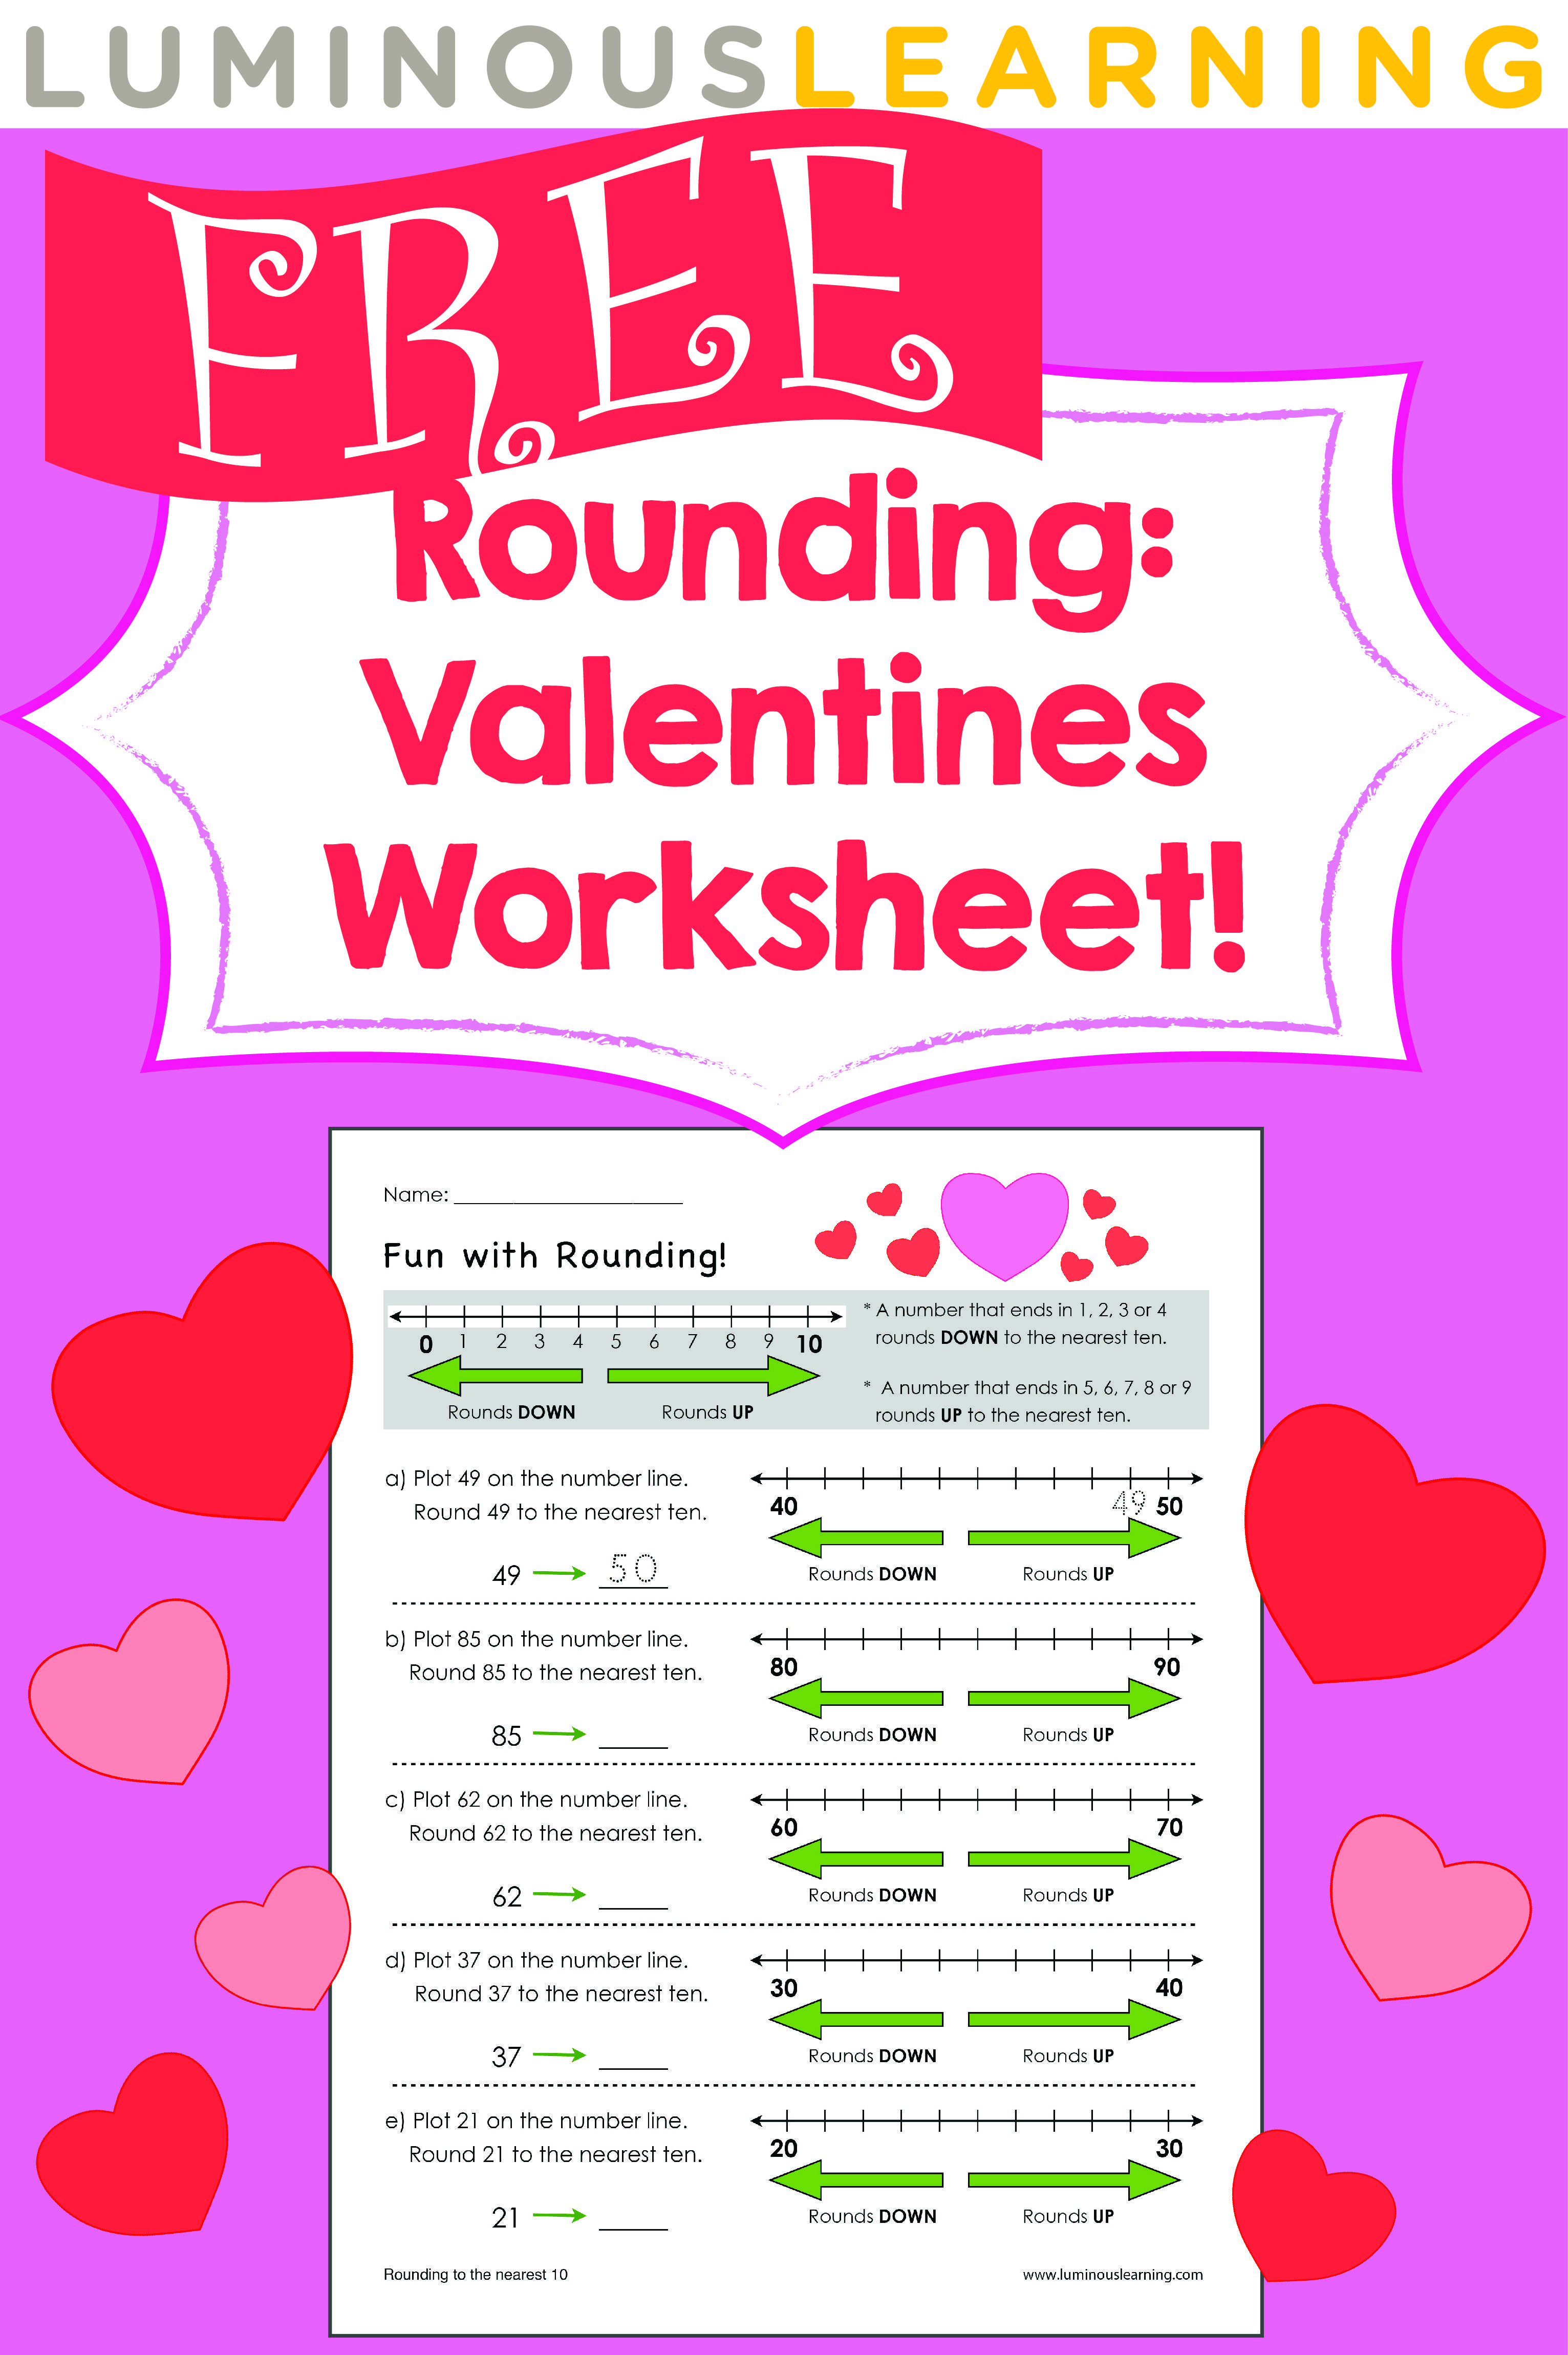 Luminous Learning Free Valentines Worksheet Rounding